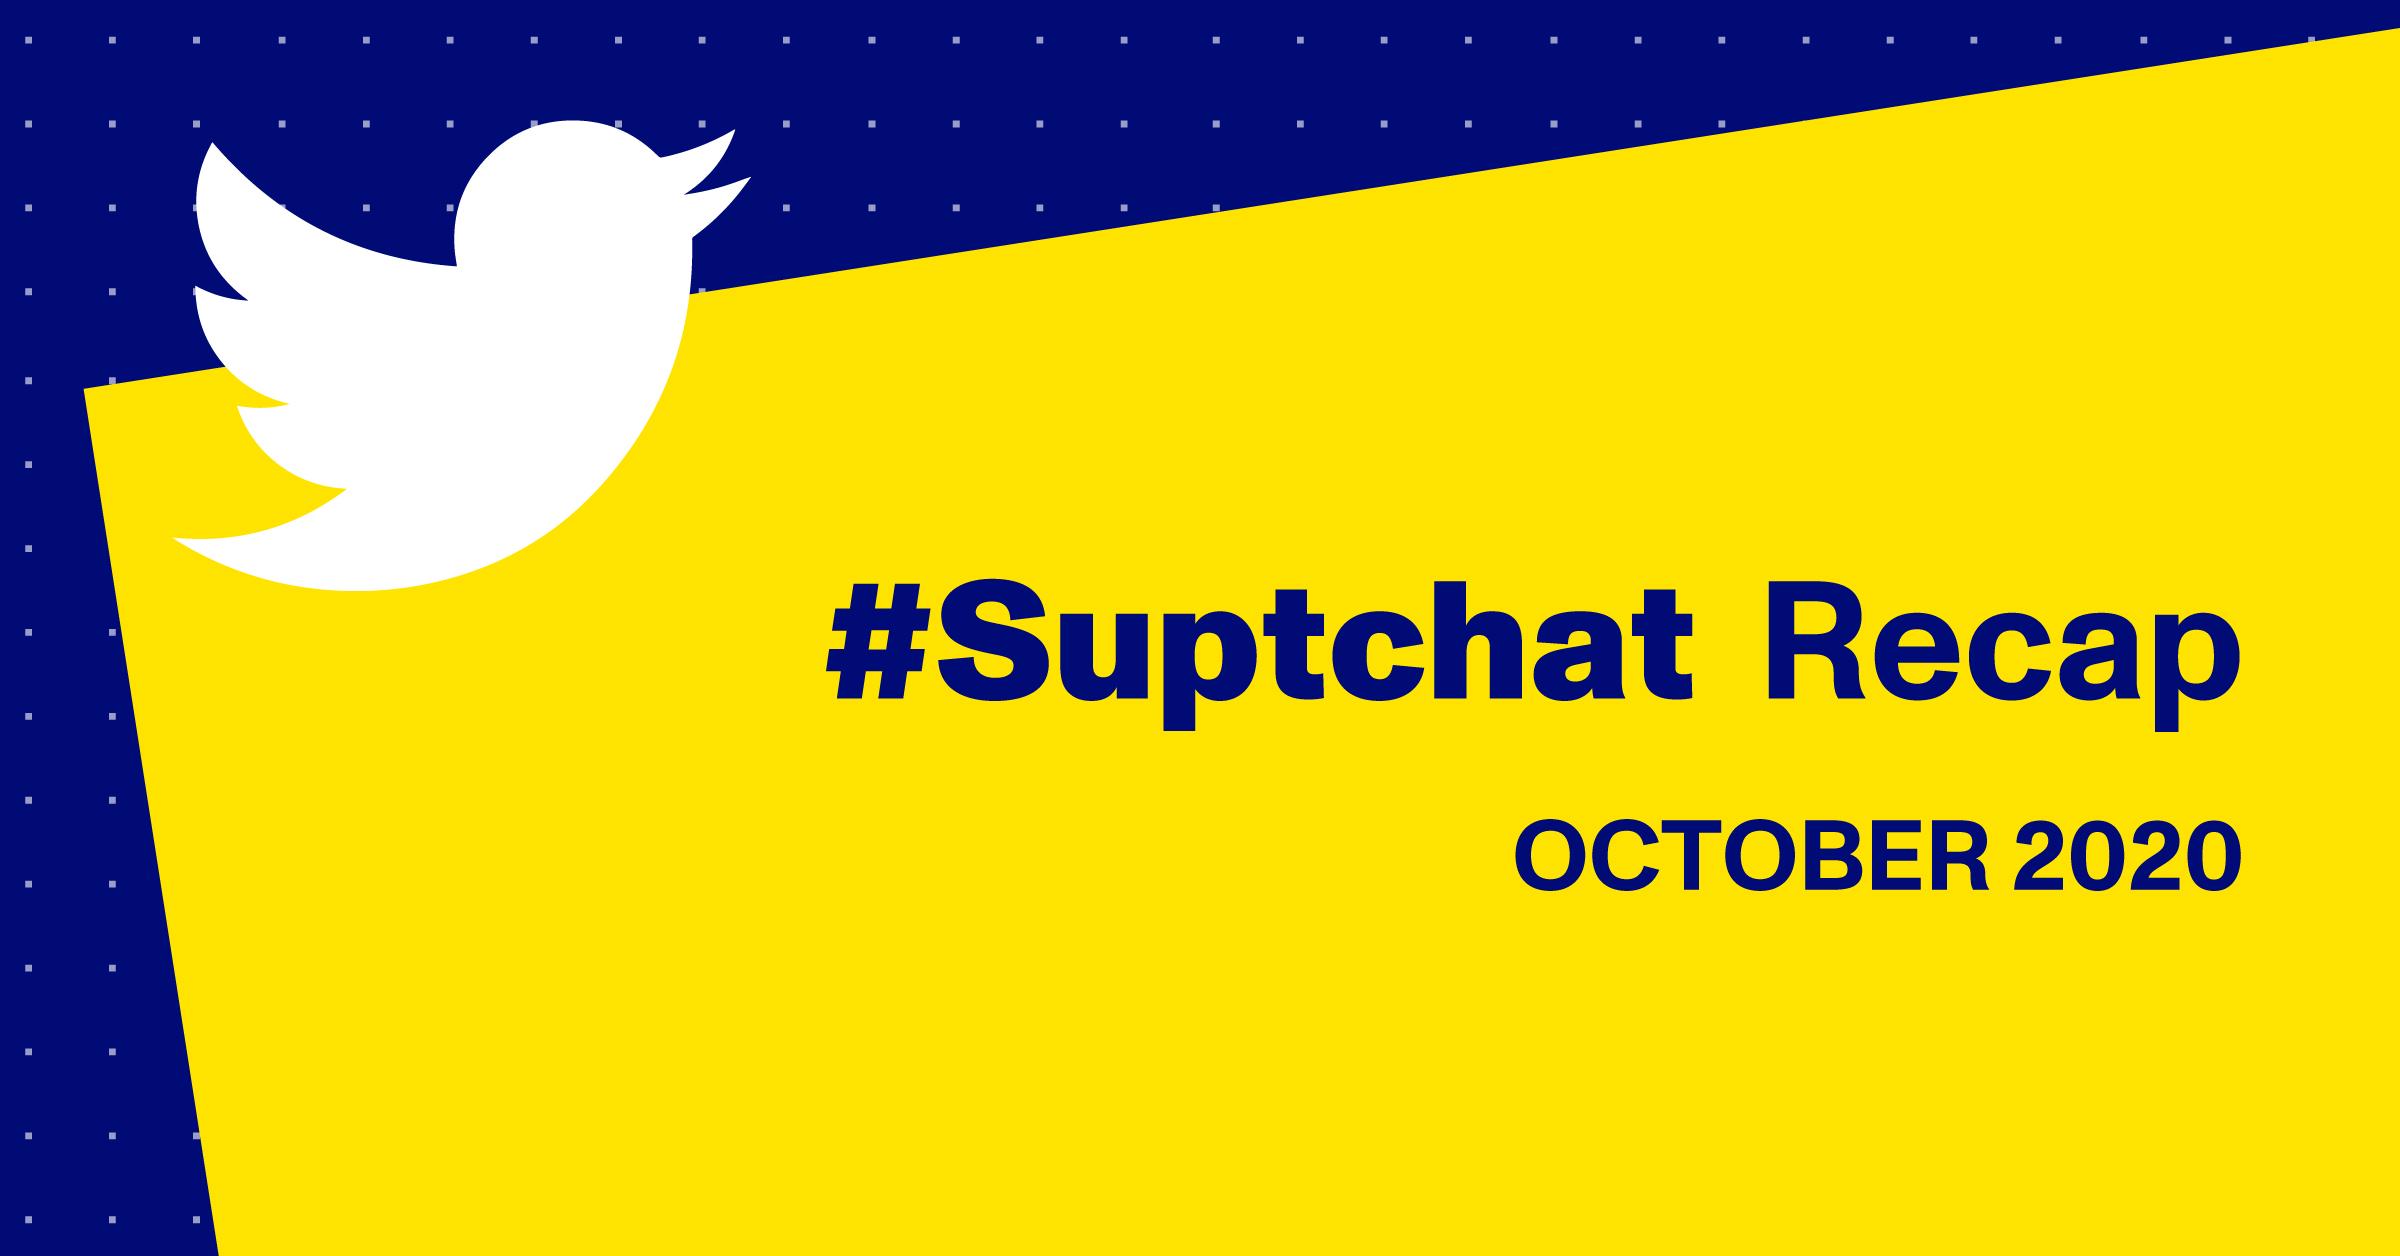 Blog Thumbnail of #Suptchat Recap from October 2020